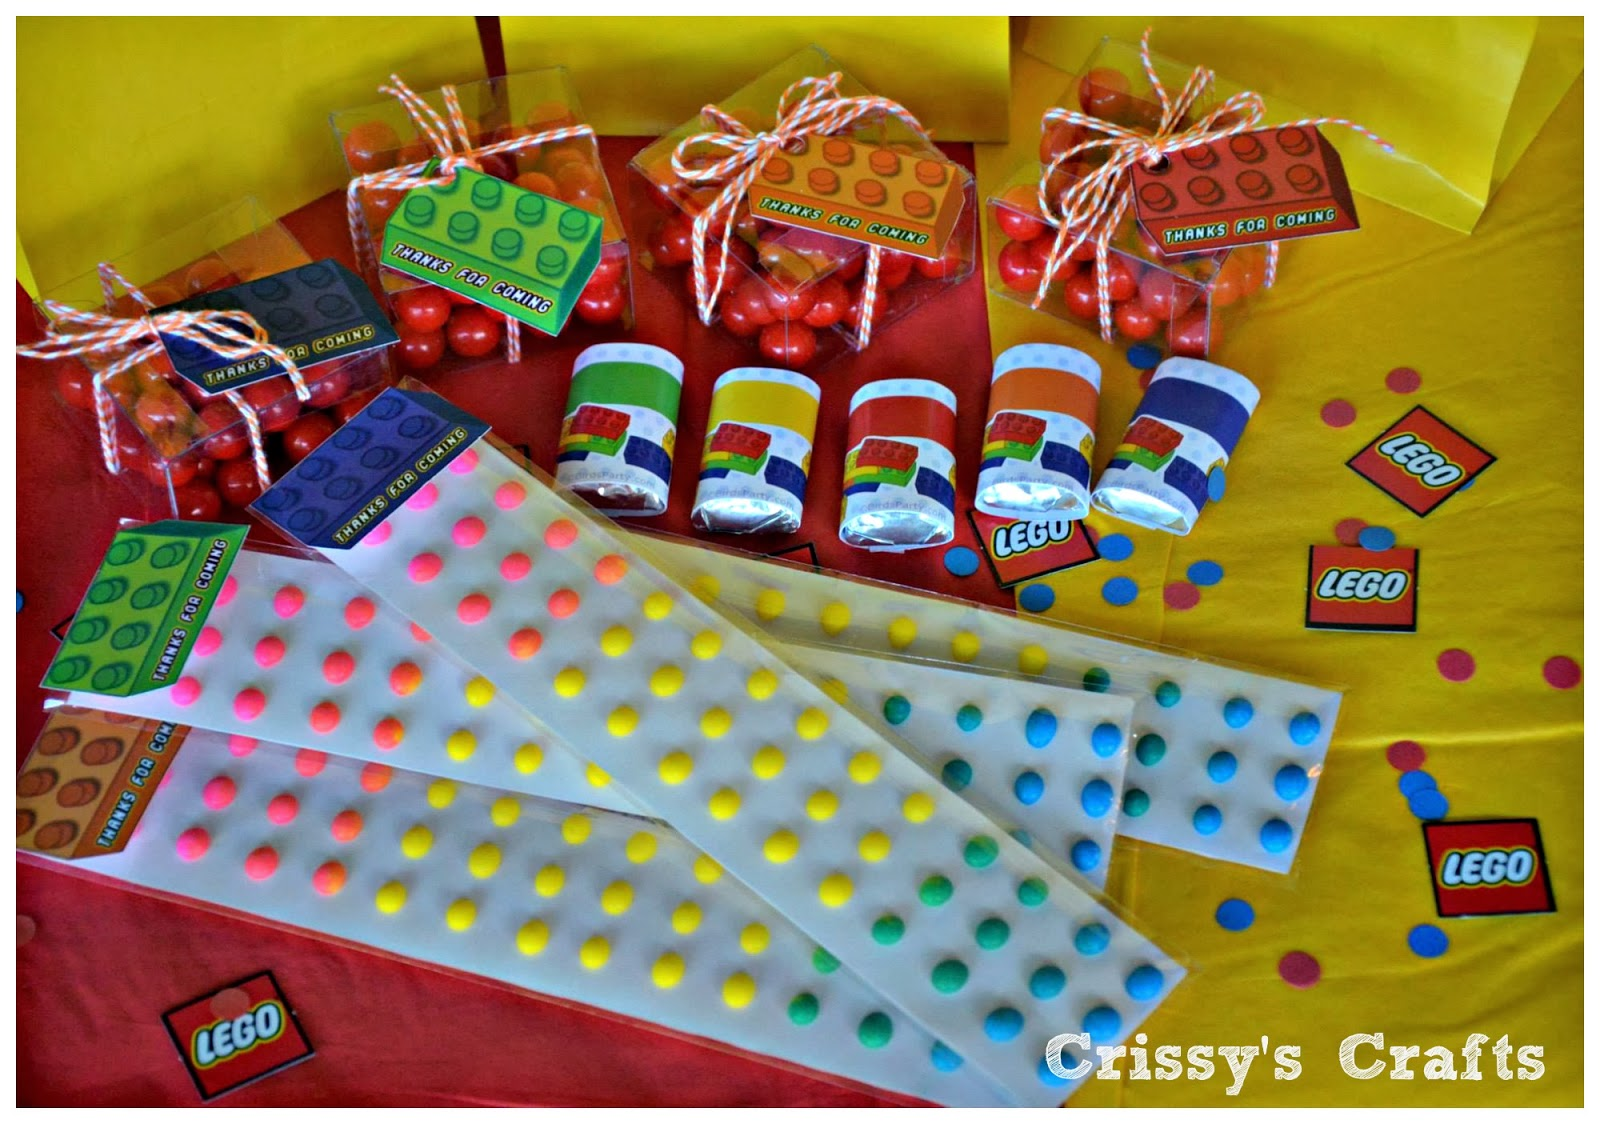 Crissy's Crafts: Lego Party Favor Ideas & Blog Hop